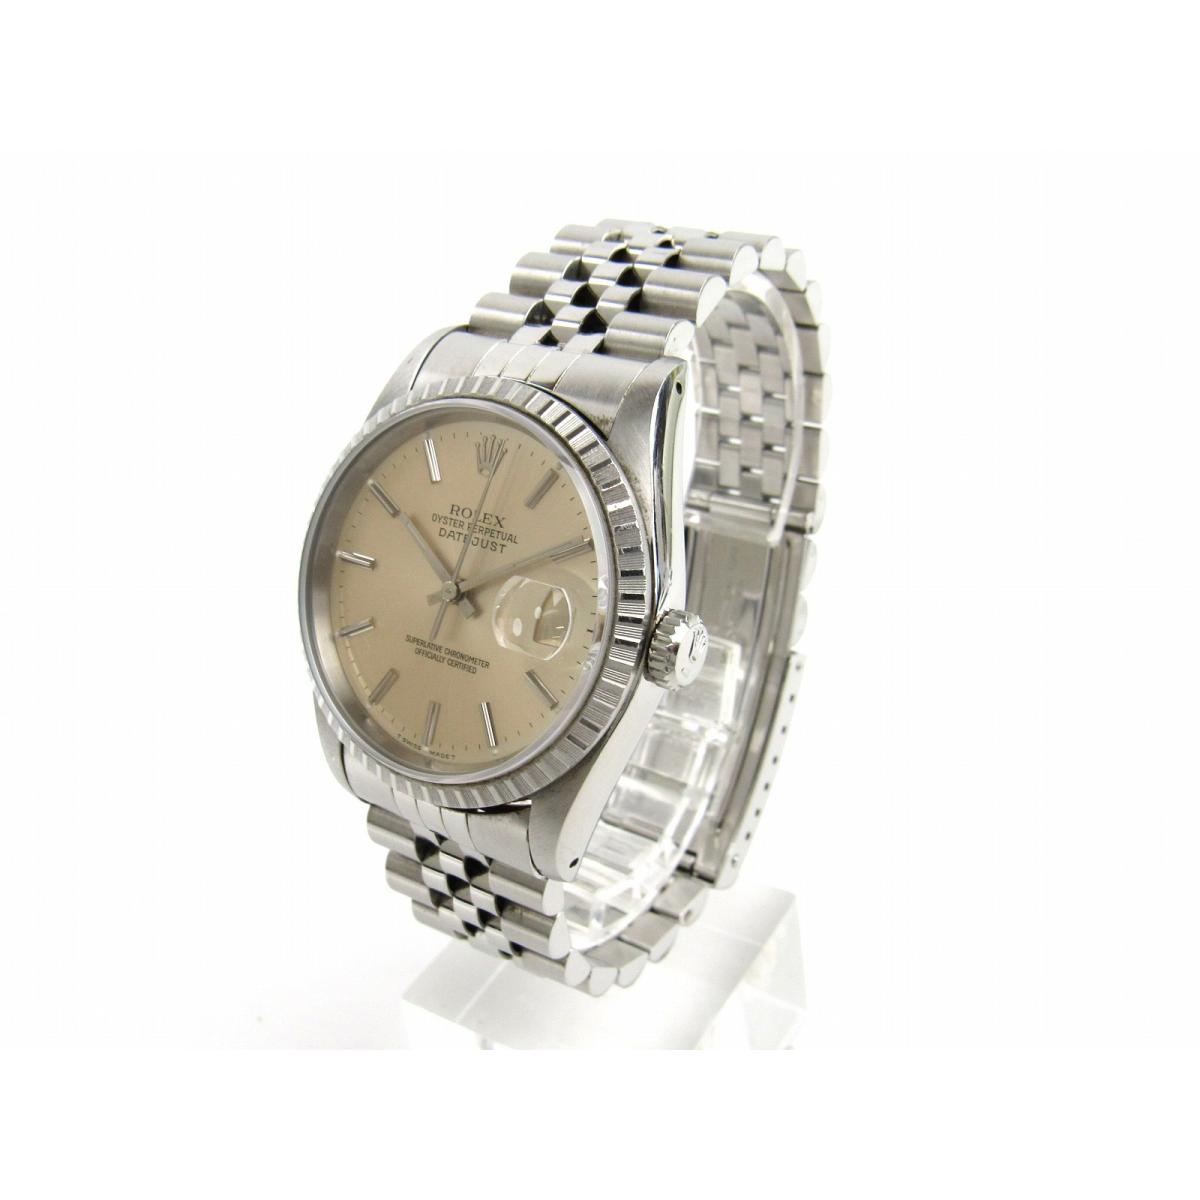 ROLEX 時計 16220 デイトジャスト/腕時計/メンズ